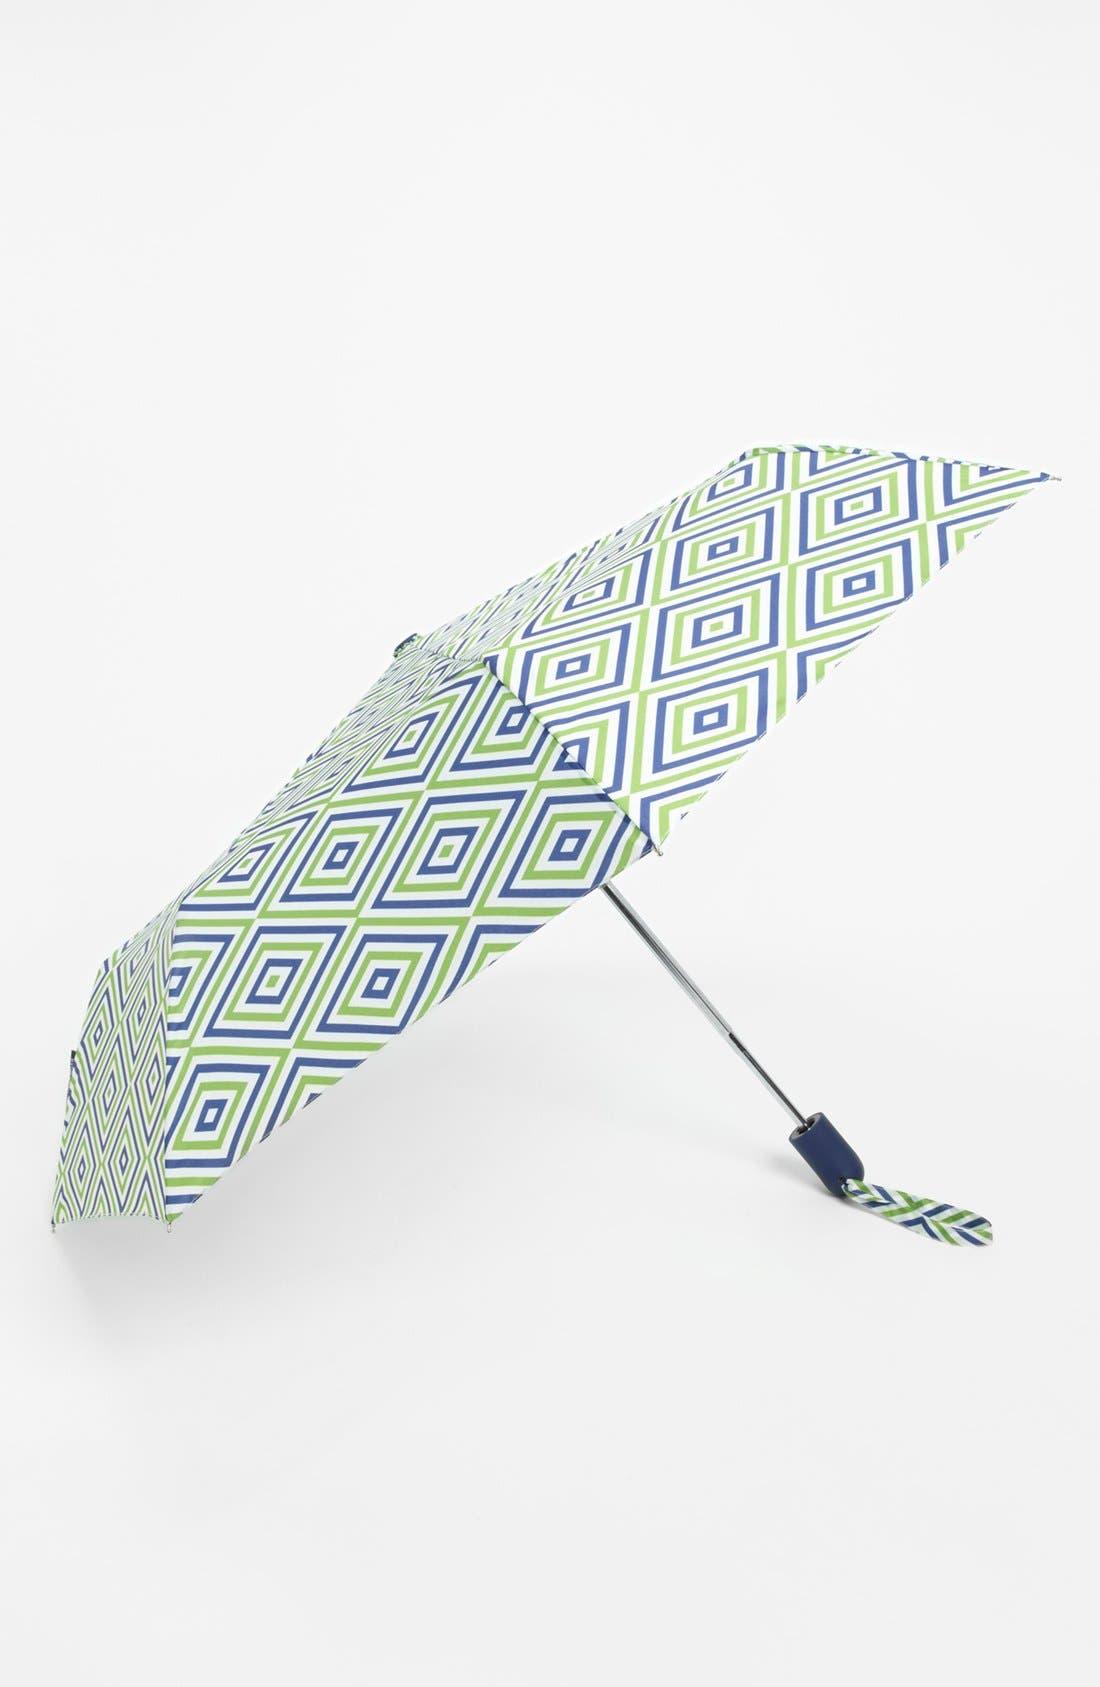 Alternate Image 1 Selected - Jonathan Adler 'Arcade' Umbrella